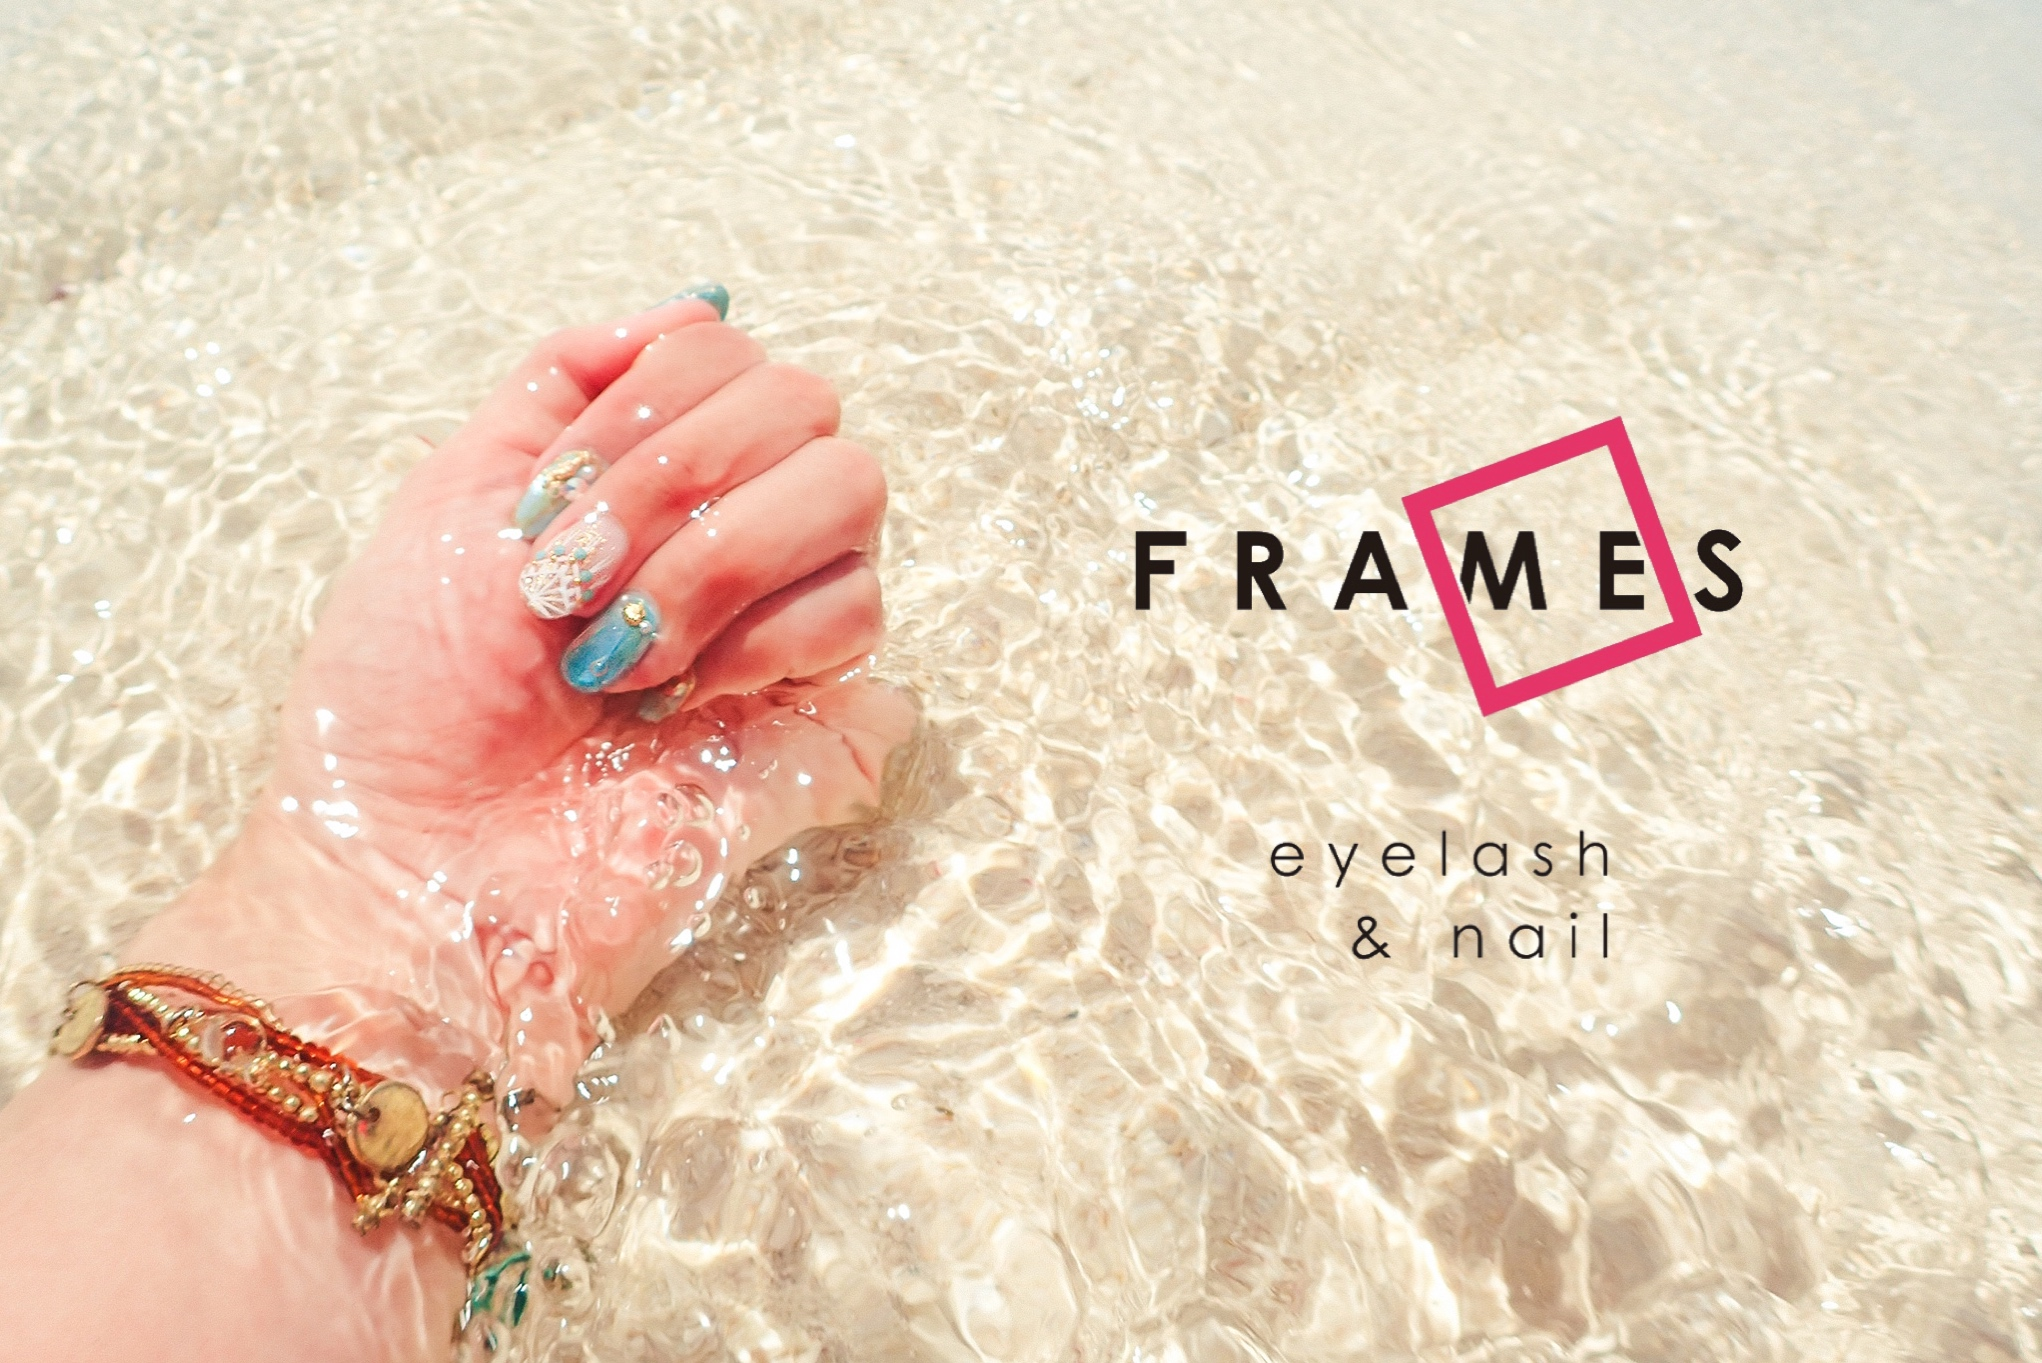 ☆ FRAMES eyelash&nail コンセプト☆